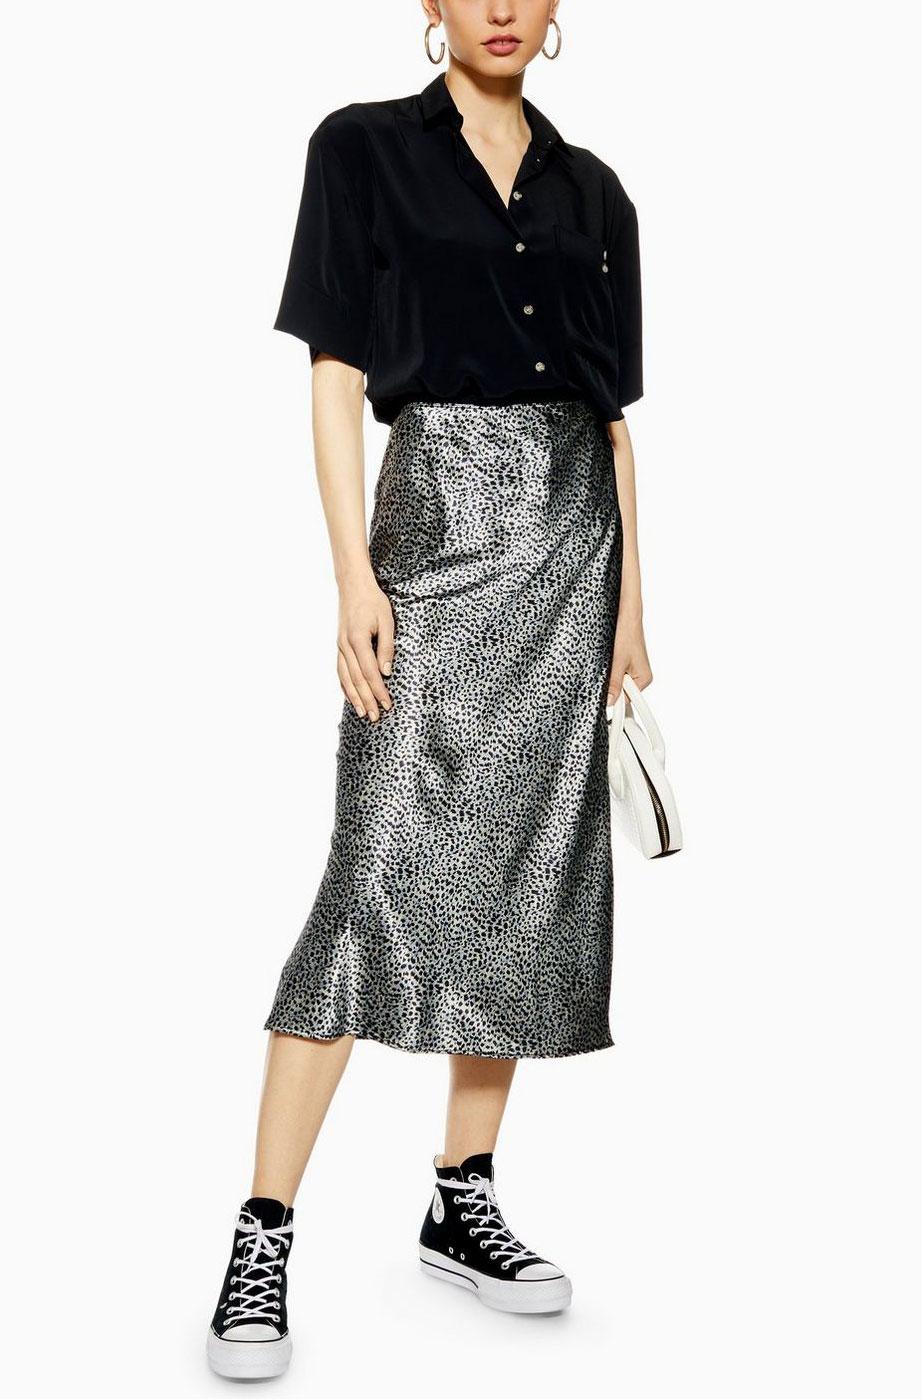 Top Shop Print Skirt  $68